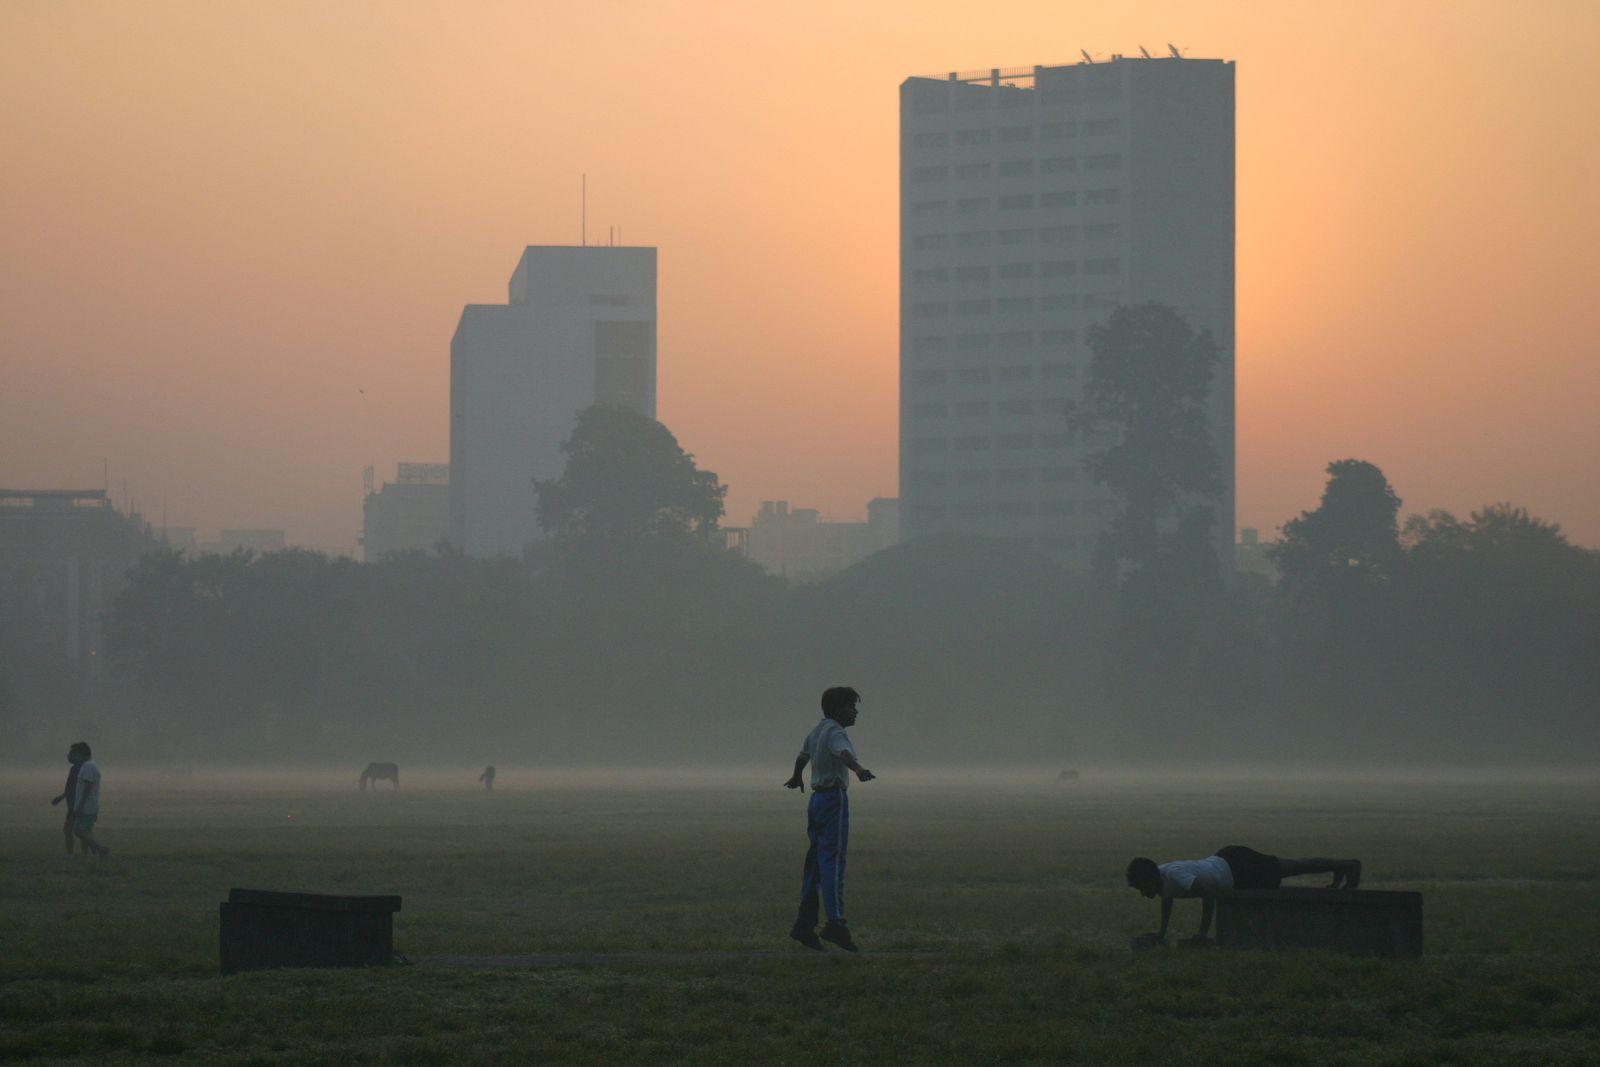 Indien / Luftverschutzung / Kalkutta